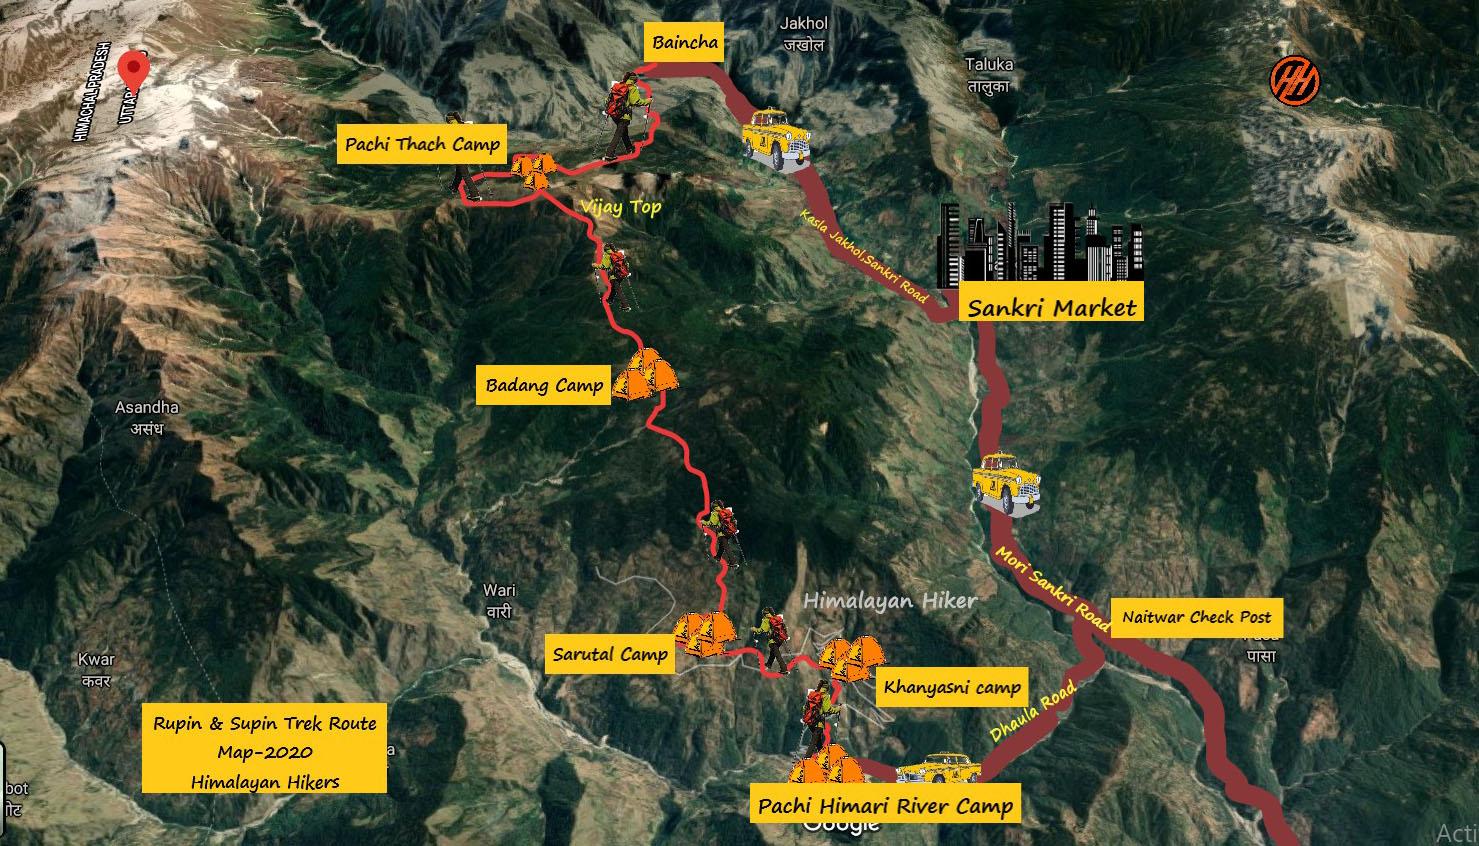 Rupin & Supin Trek Route Map